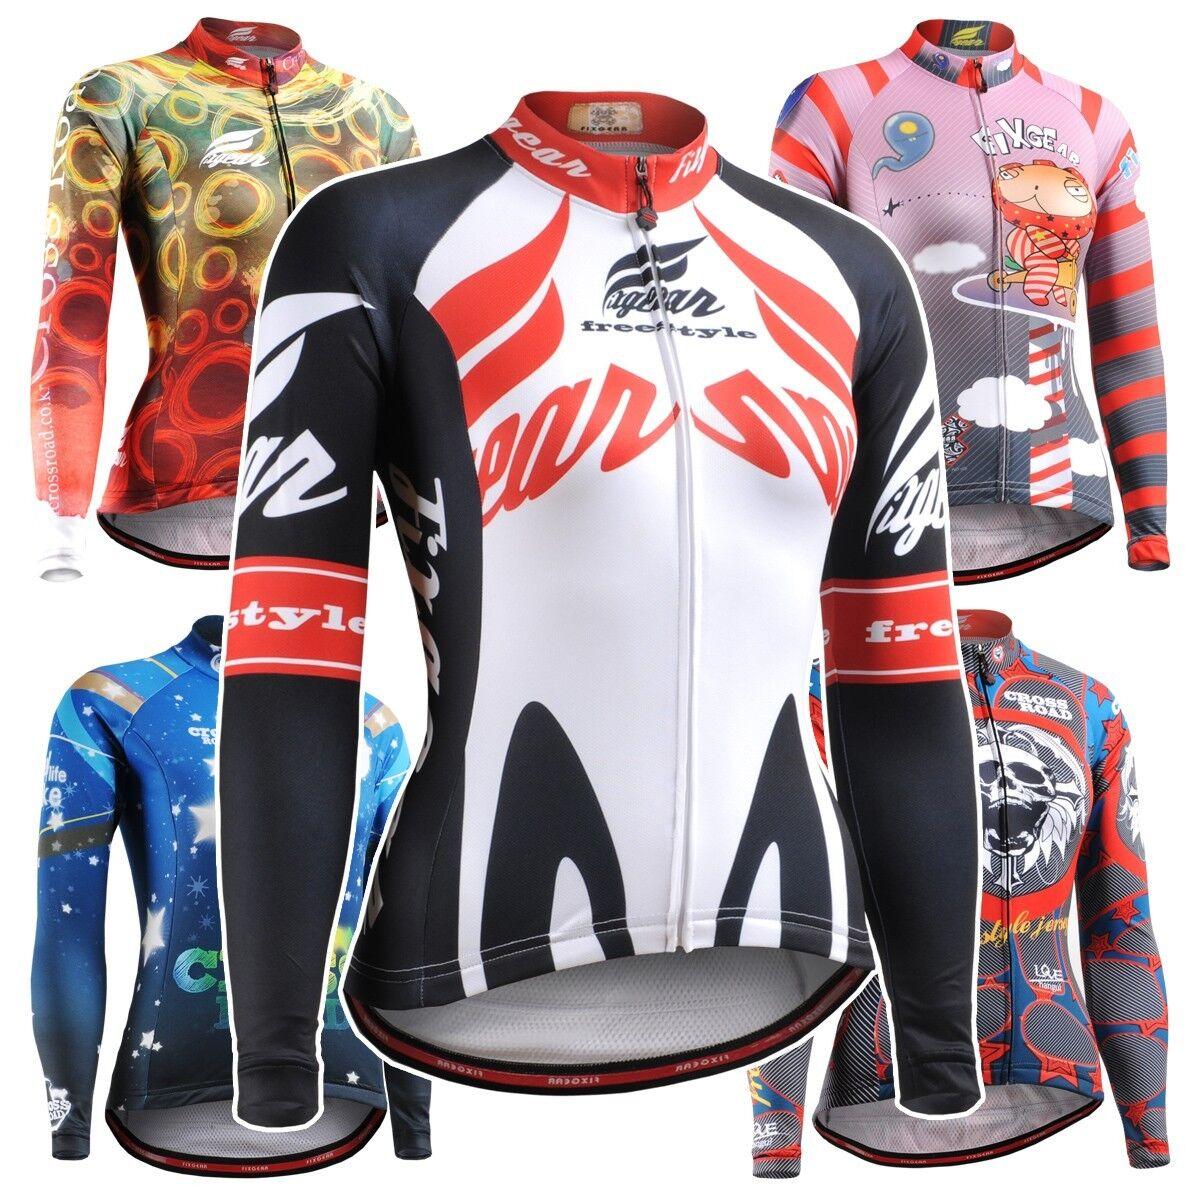 FIXGEAR Women's Cycling Jersey Long Sleeve Series MTB Bike Shirts Bicycle Road